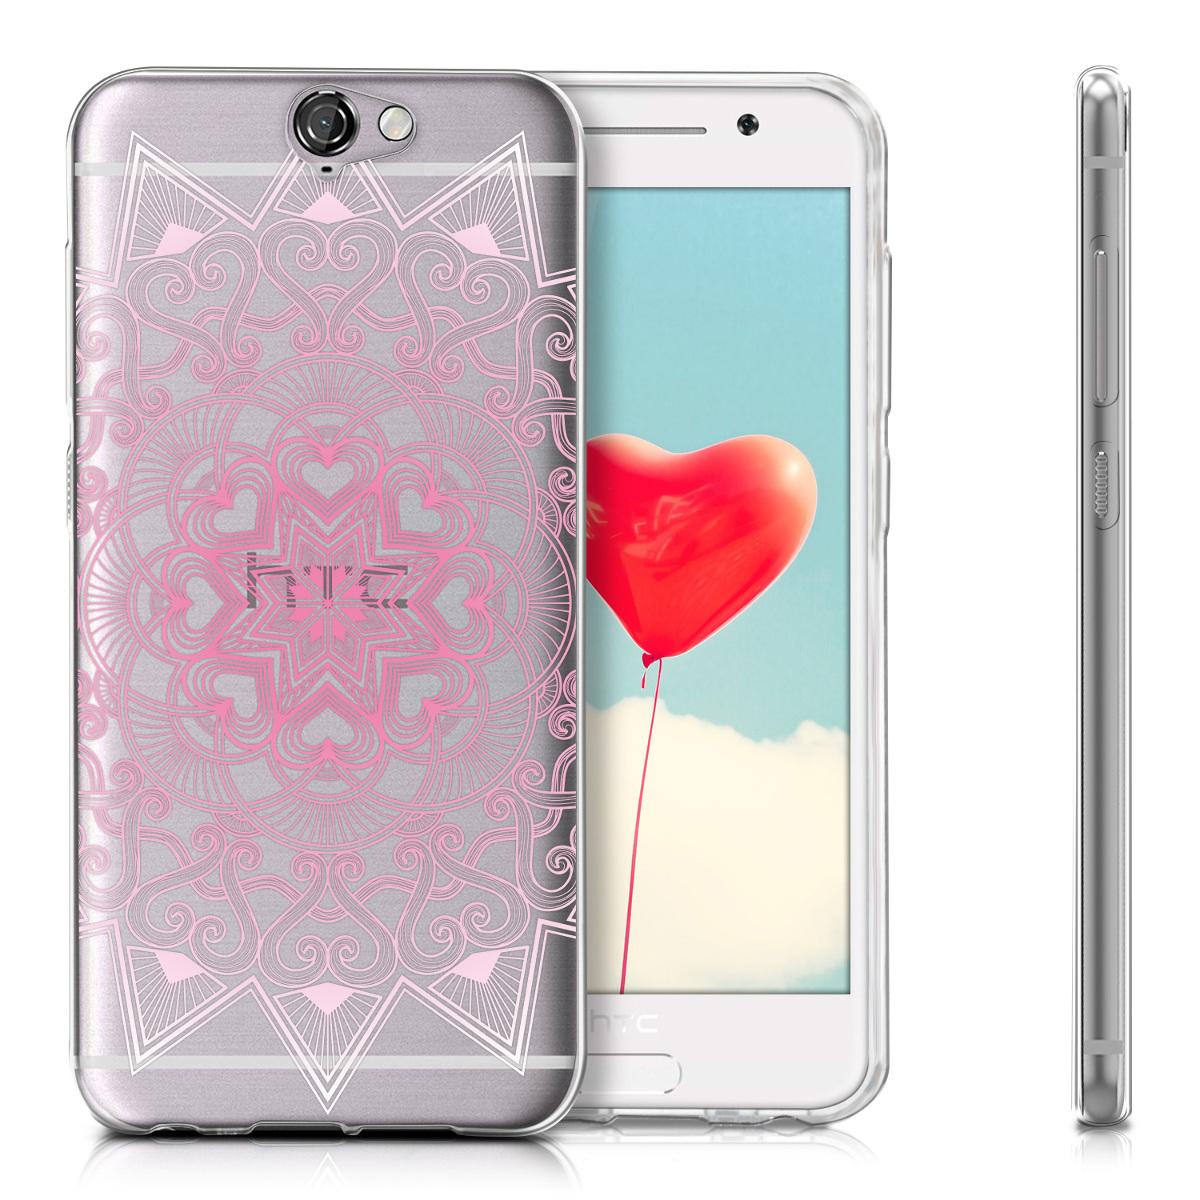 COQUE-EN-SILICONE-POUR-HTC-ONE-A9